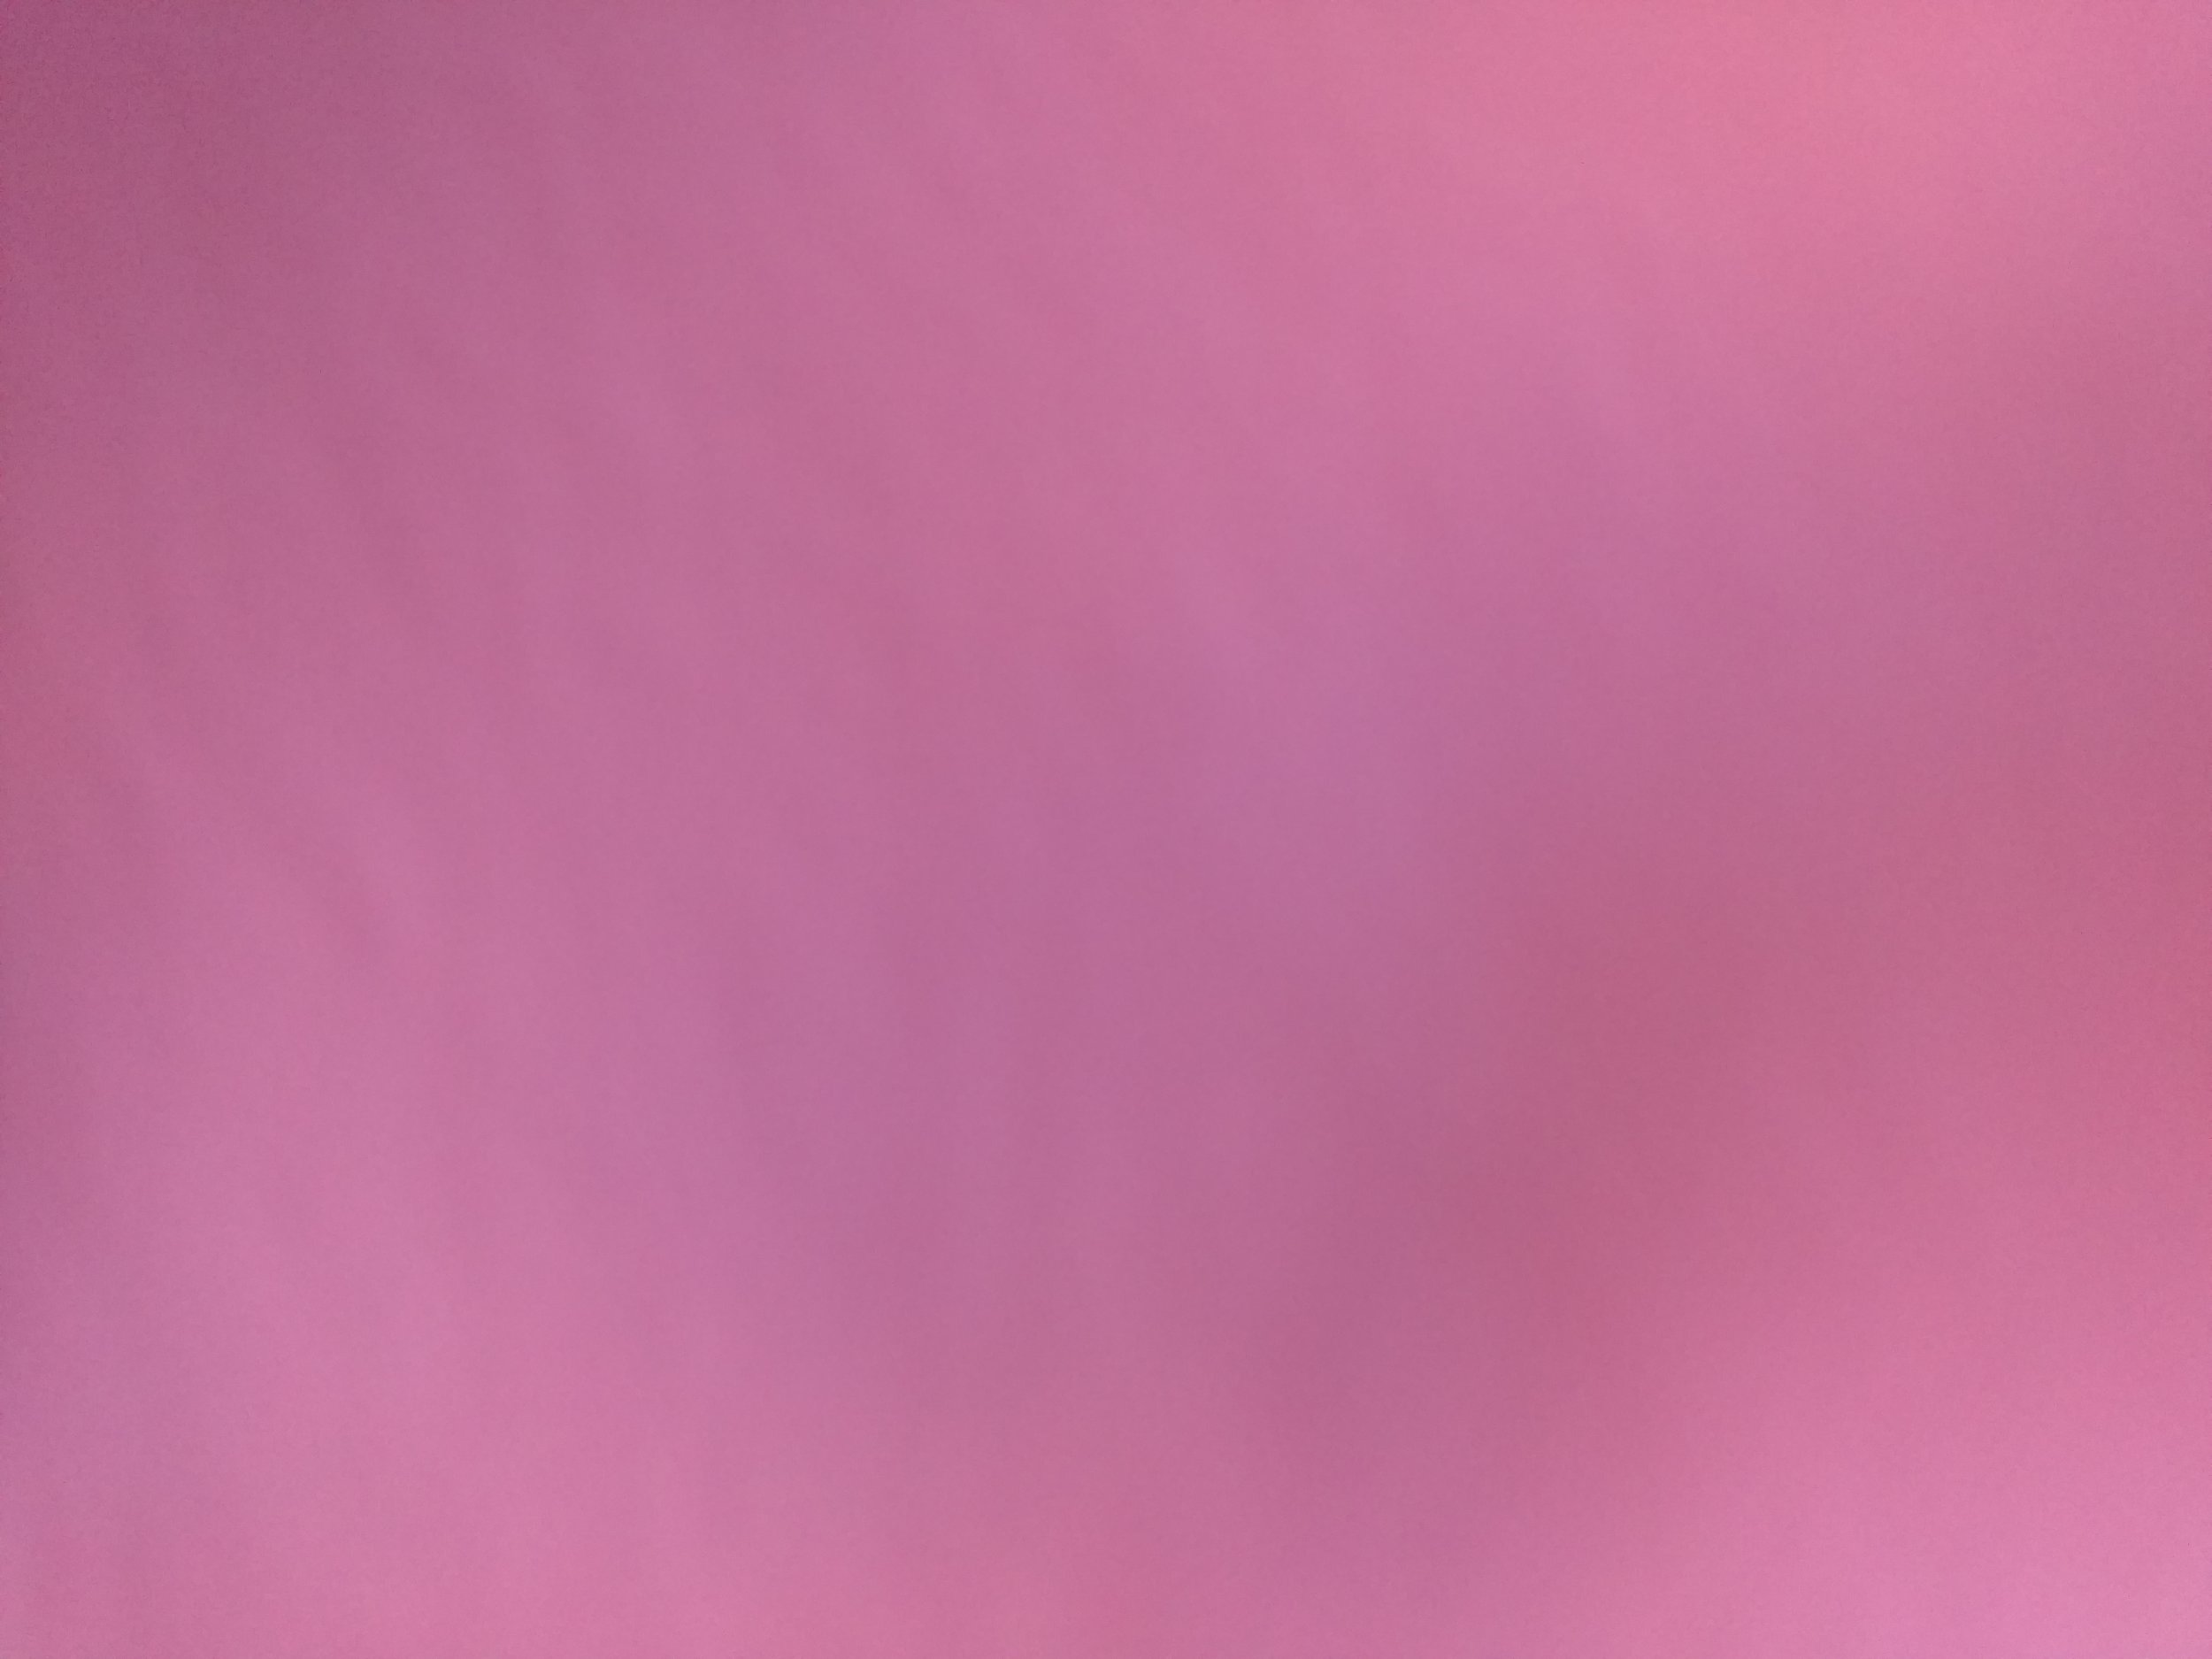 willroth-co-free-texture-gradient-095.jpg